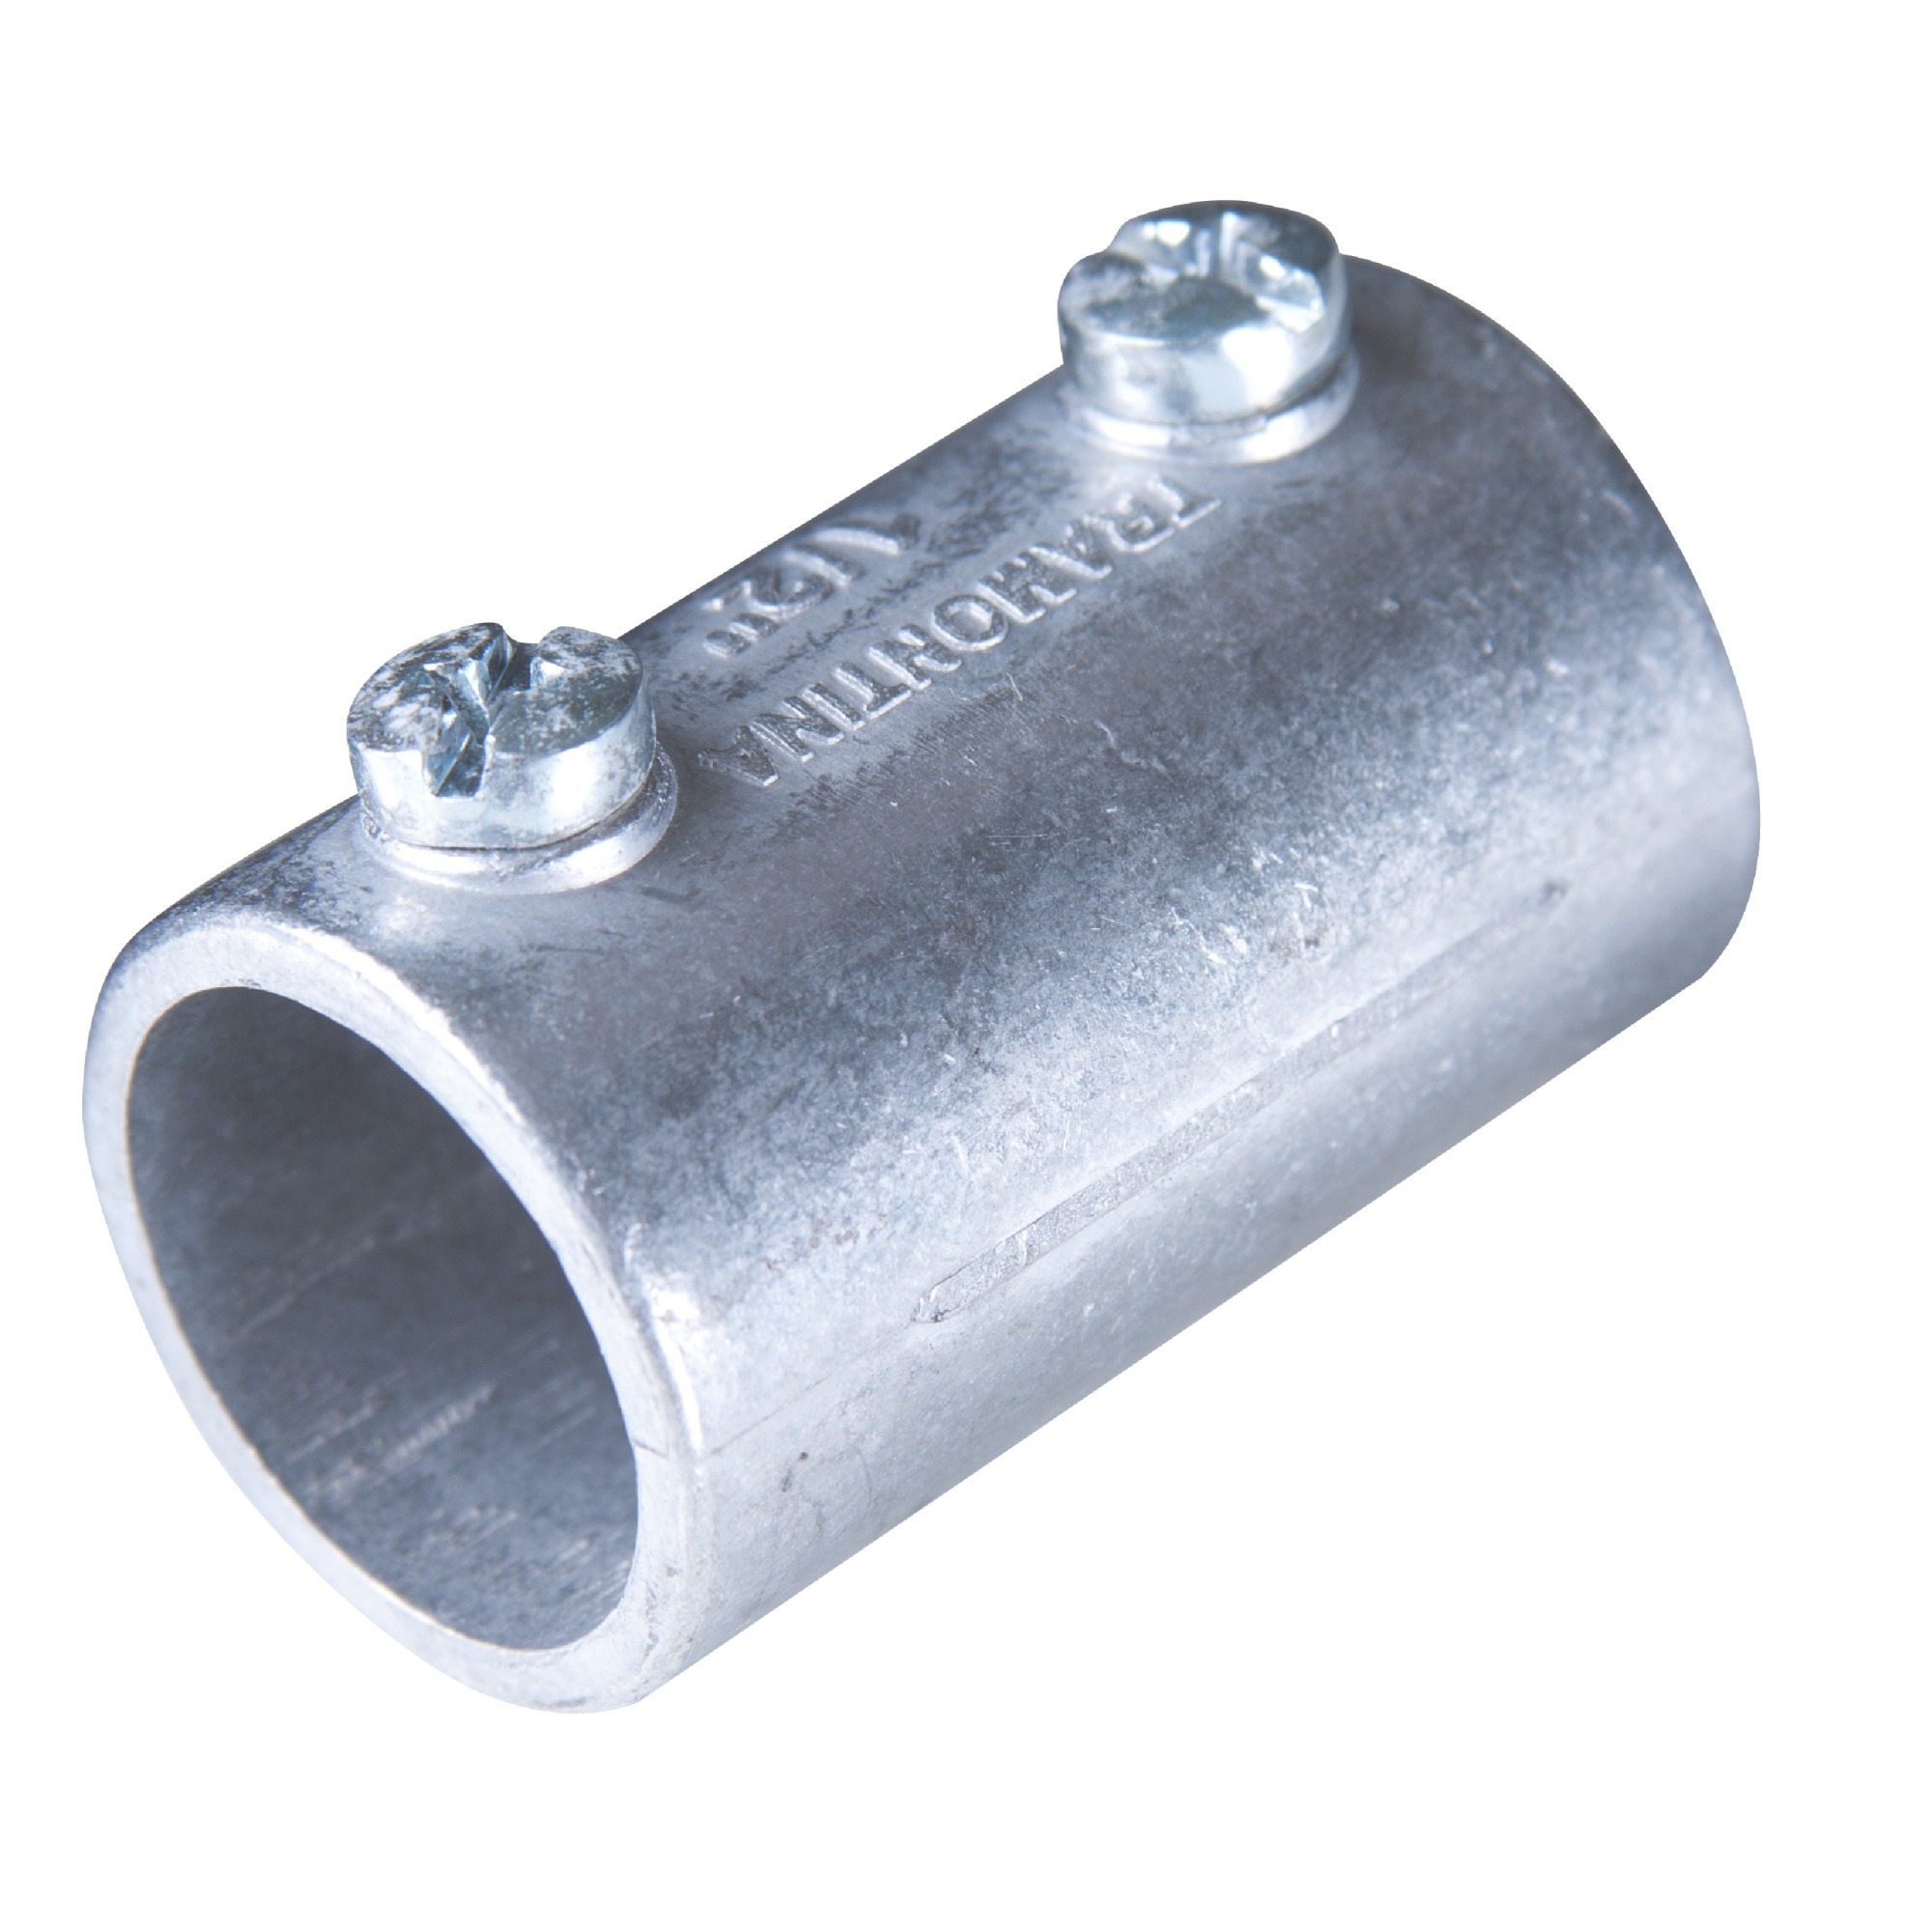 Luva Pressao 34 Aluminio Antichamas - Tramontina